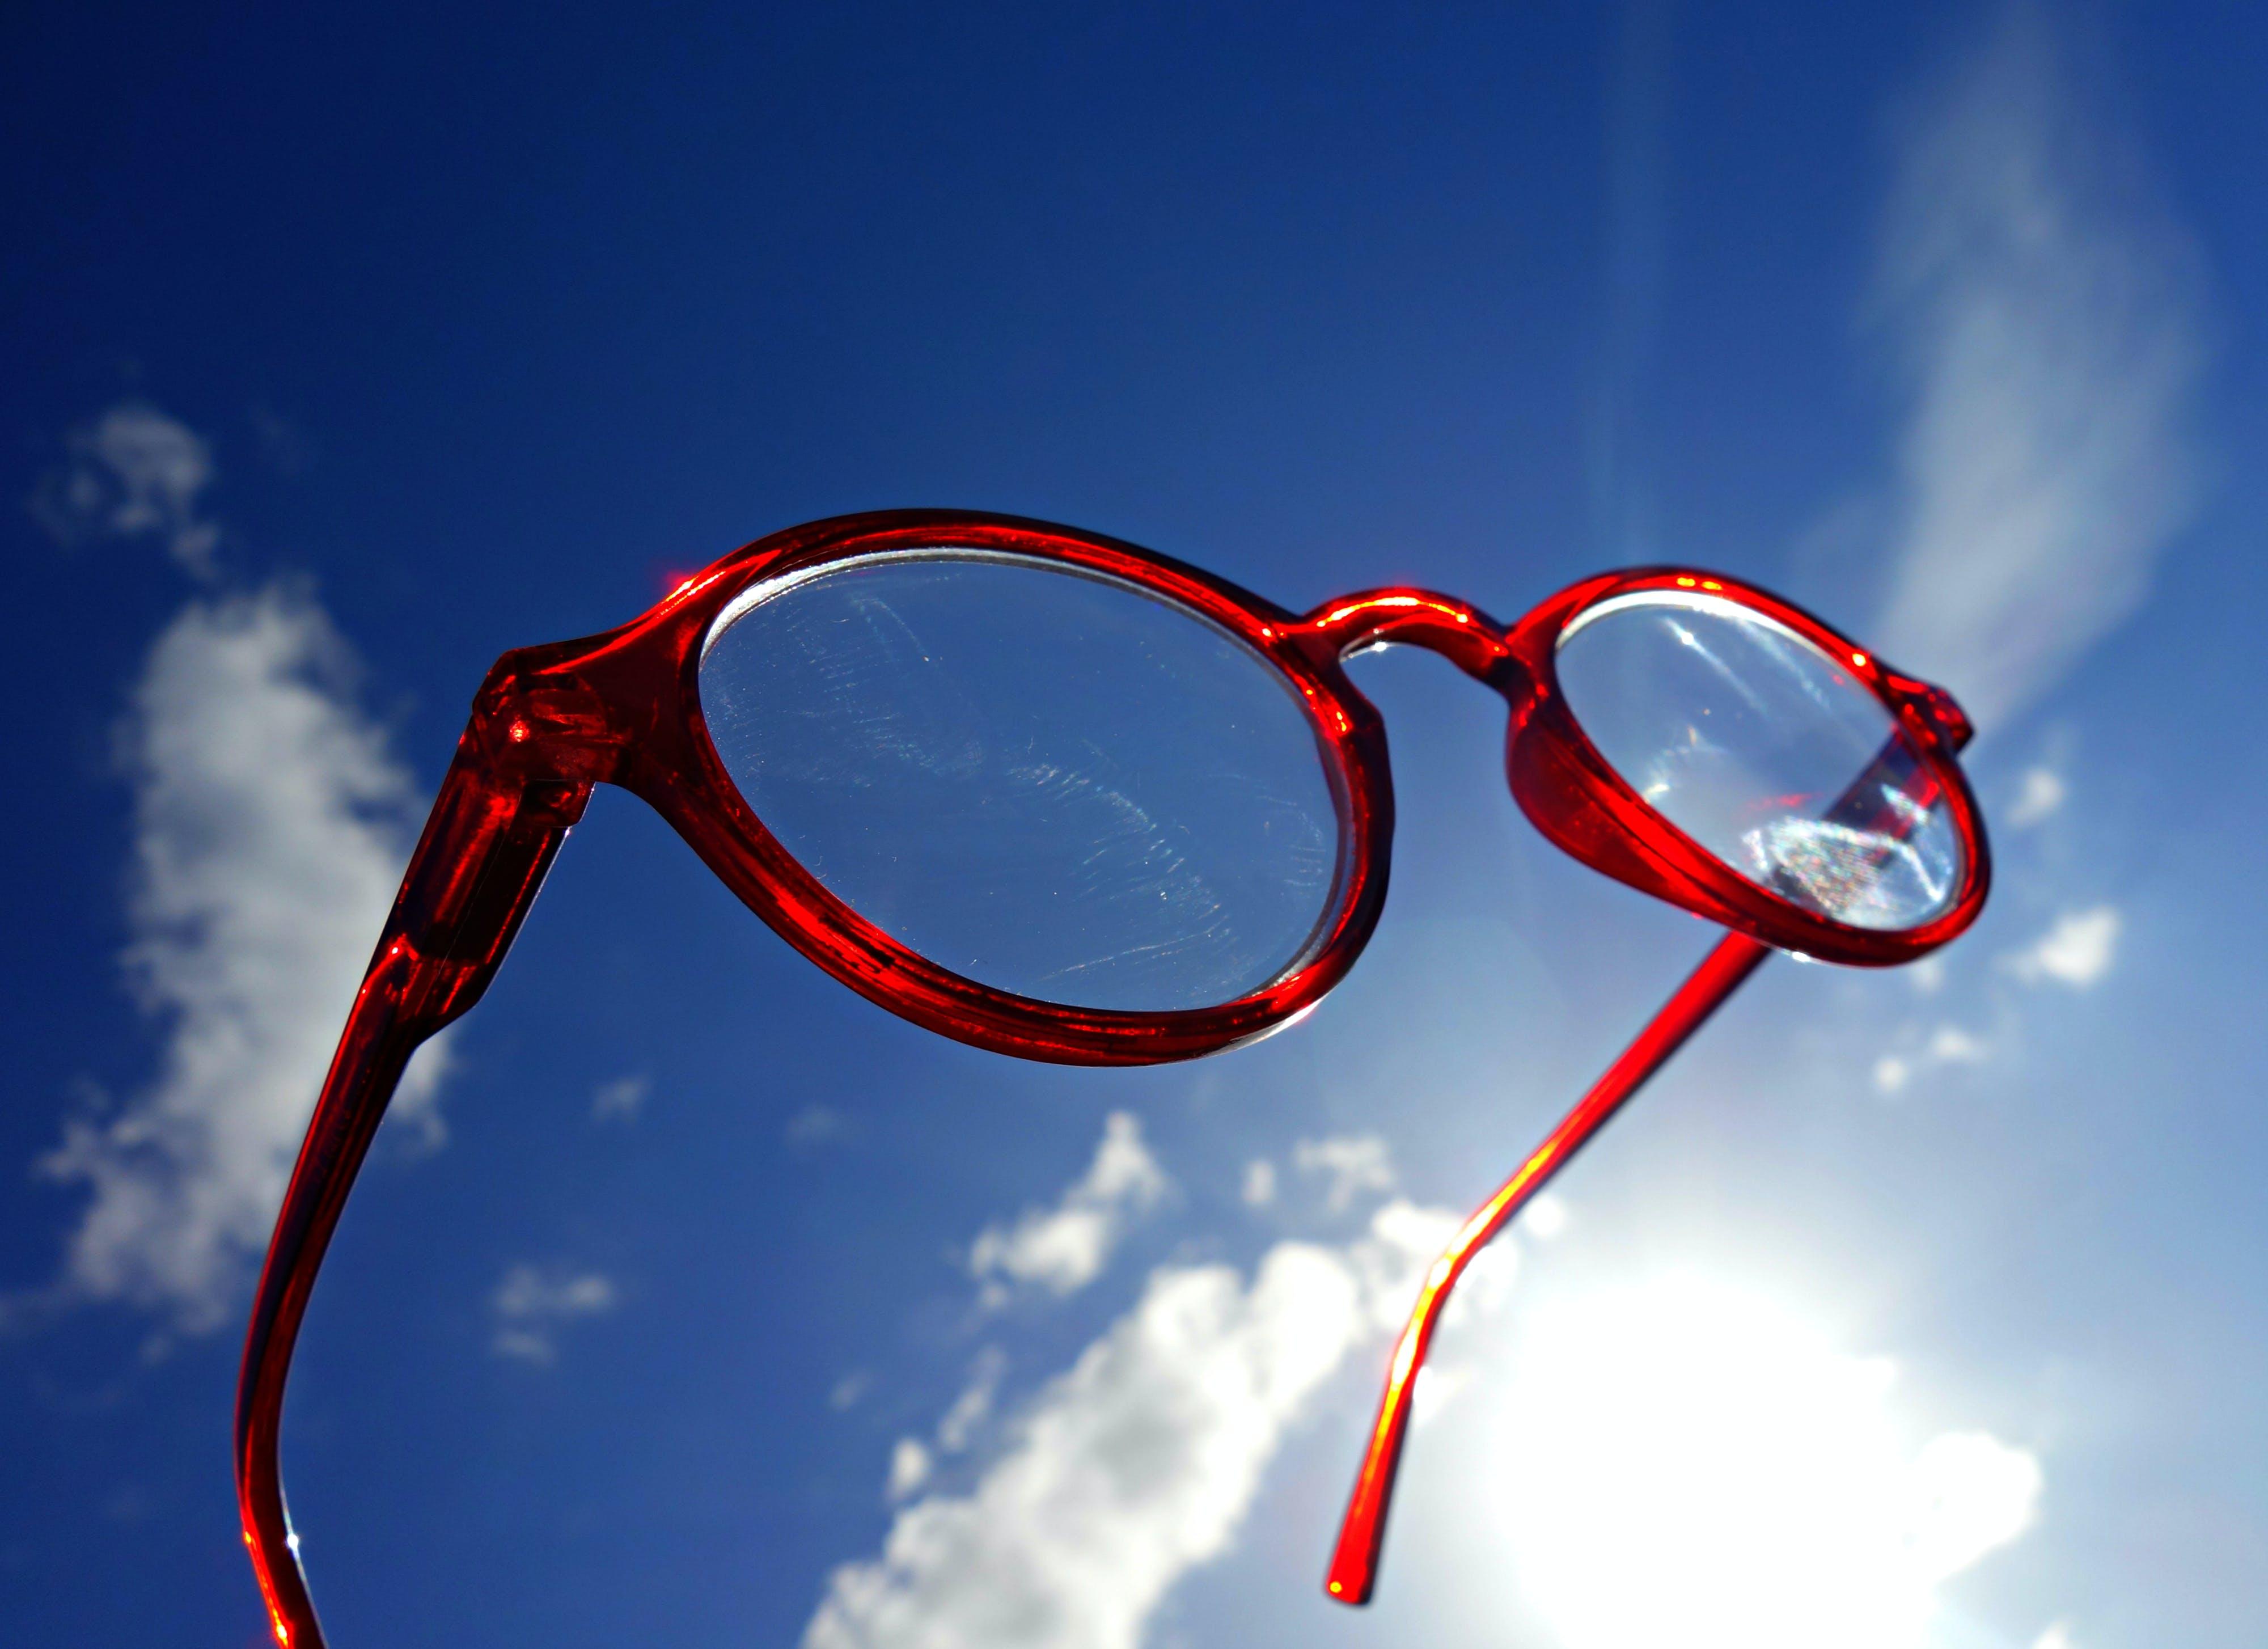 of clouds, eyewear, glasses, optical